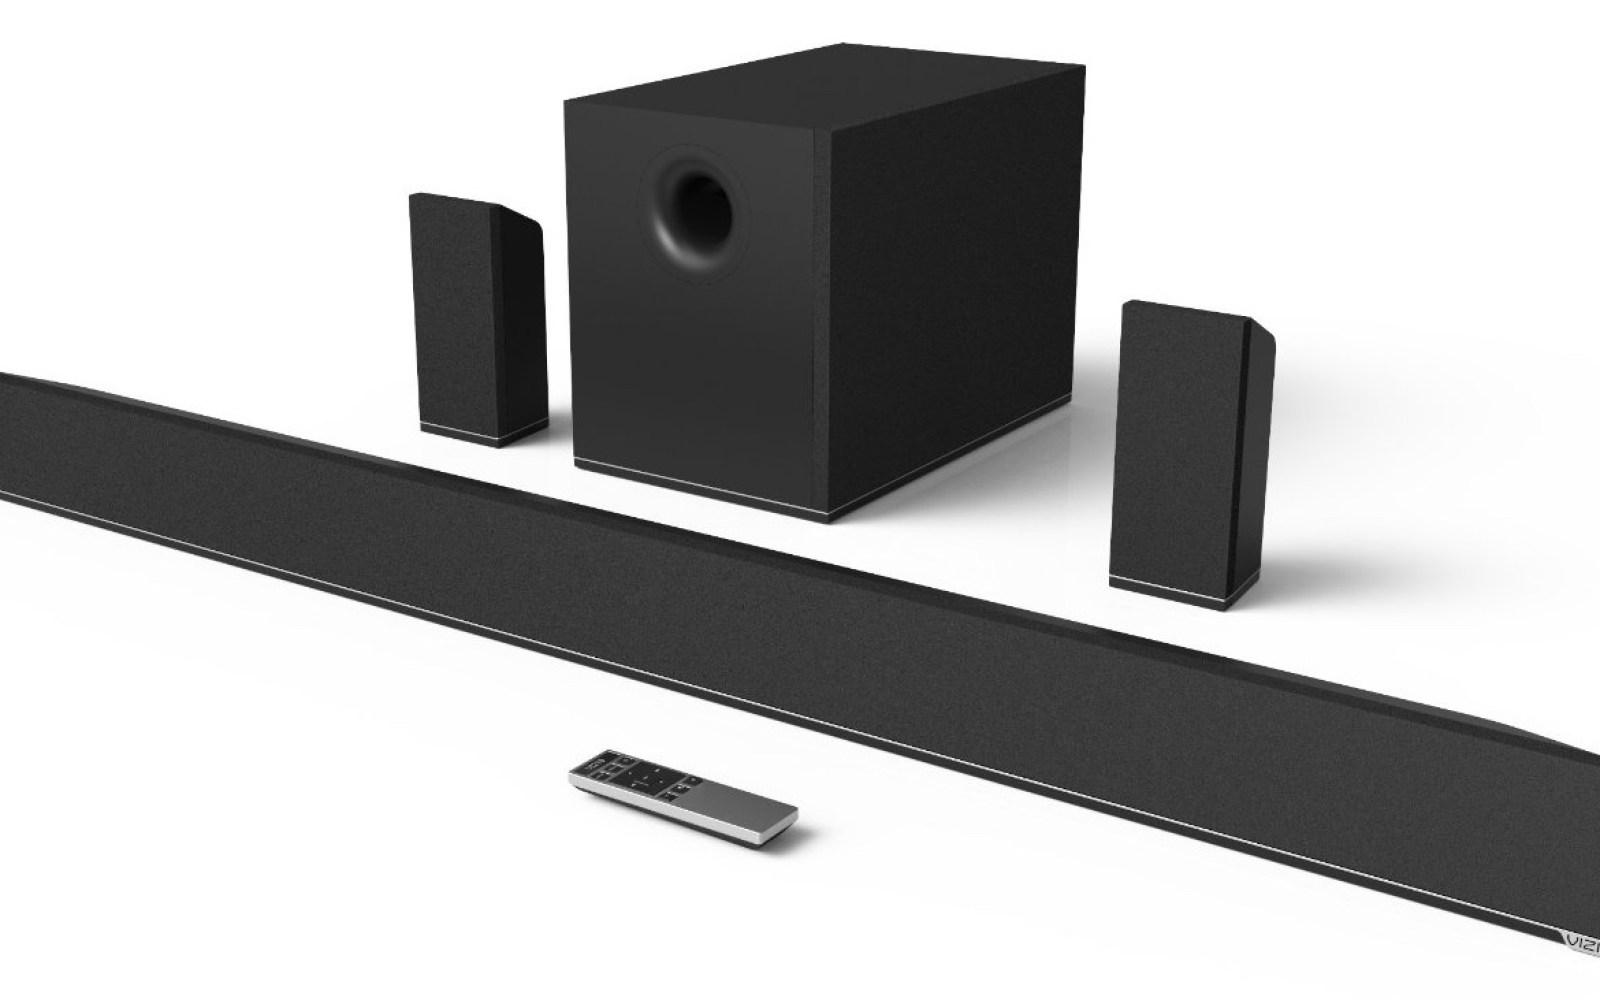 VIZIO 5.1-Channel Bluetooth Soundbar system w/ wireless subwoofer: $300 shipped (Reg. $500)